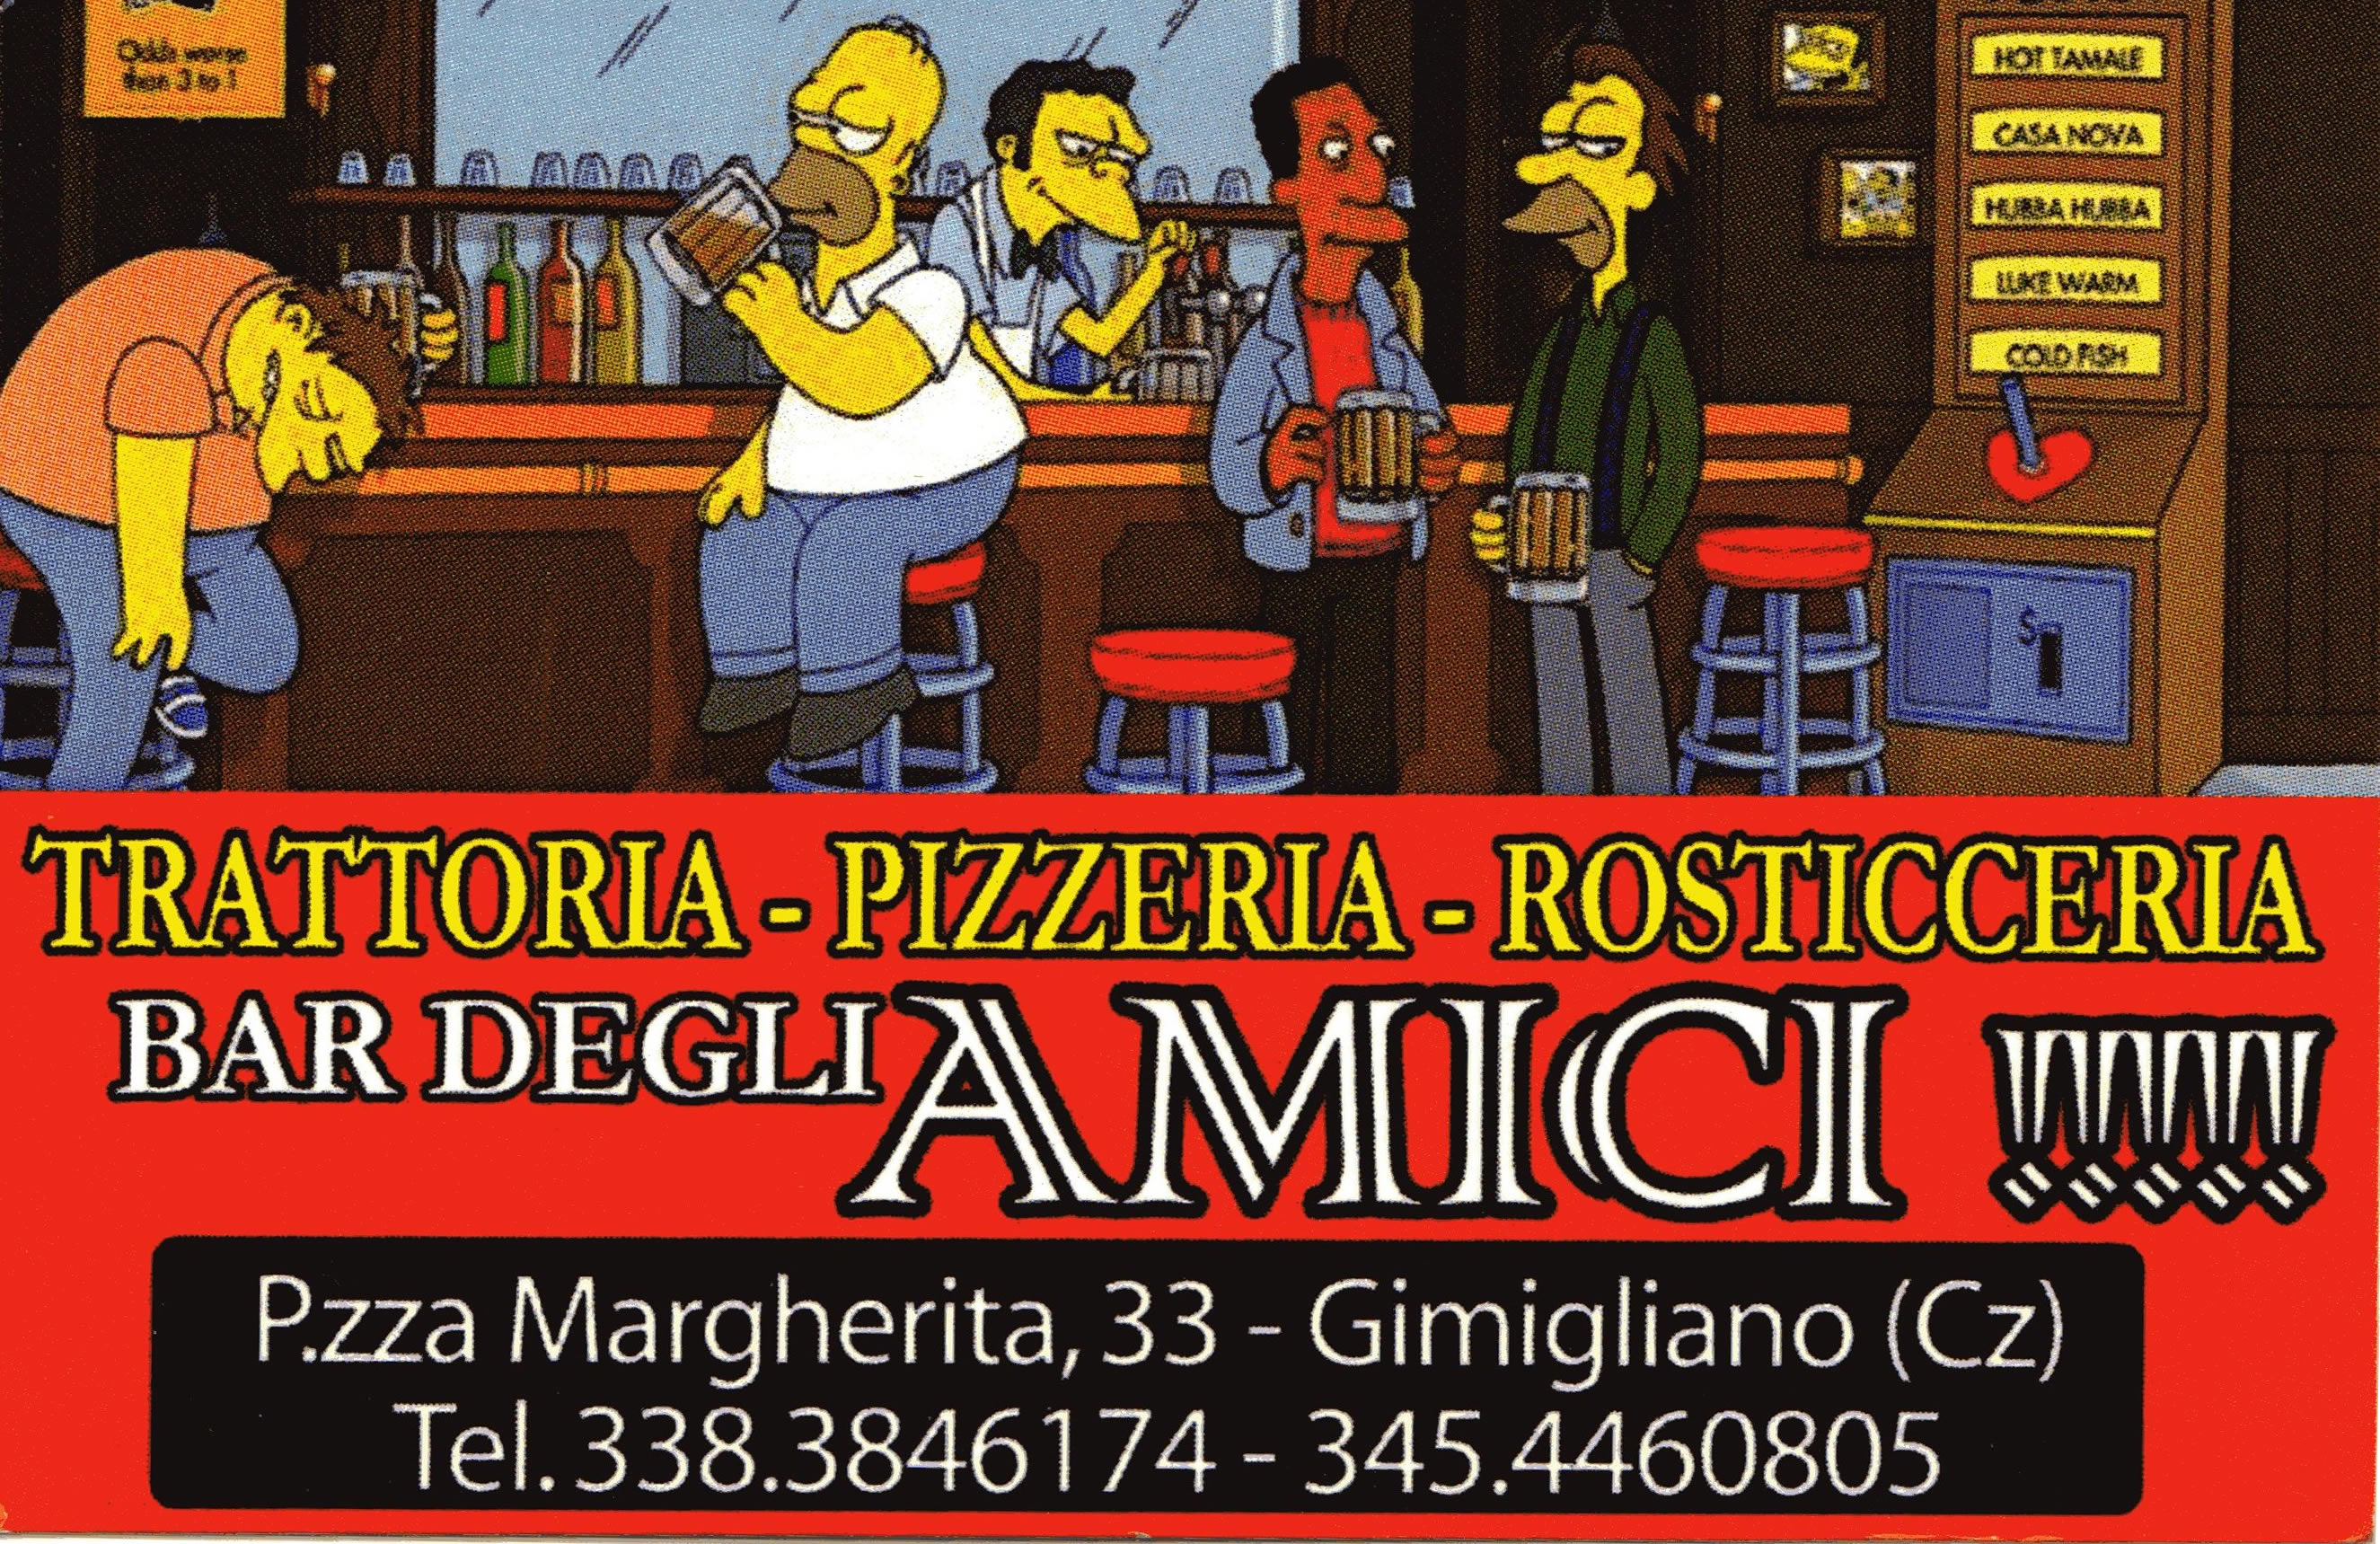 http://usdgimigliano.it/wp-content/uploads/2017/09/birreriaAmici.jpg